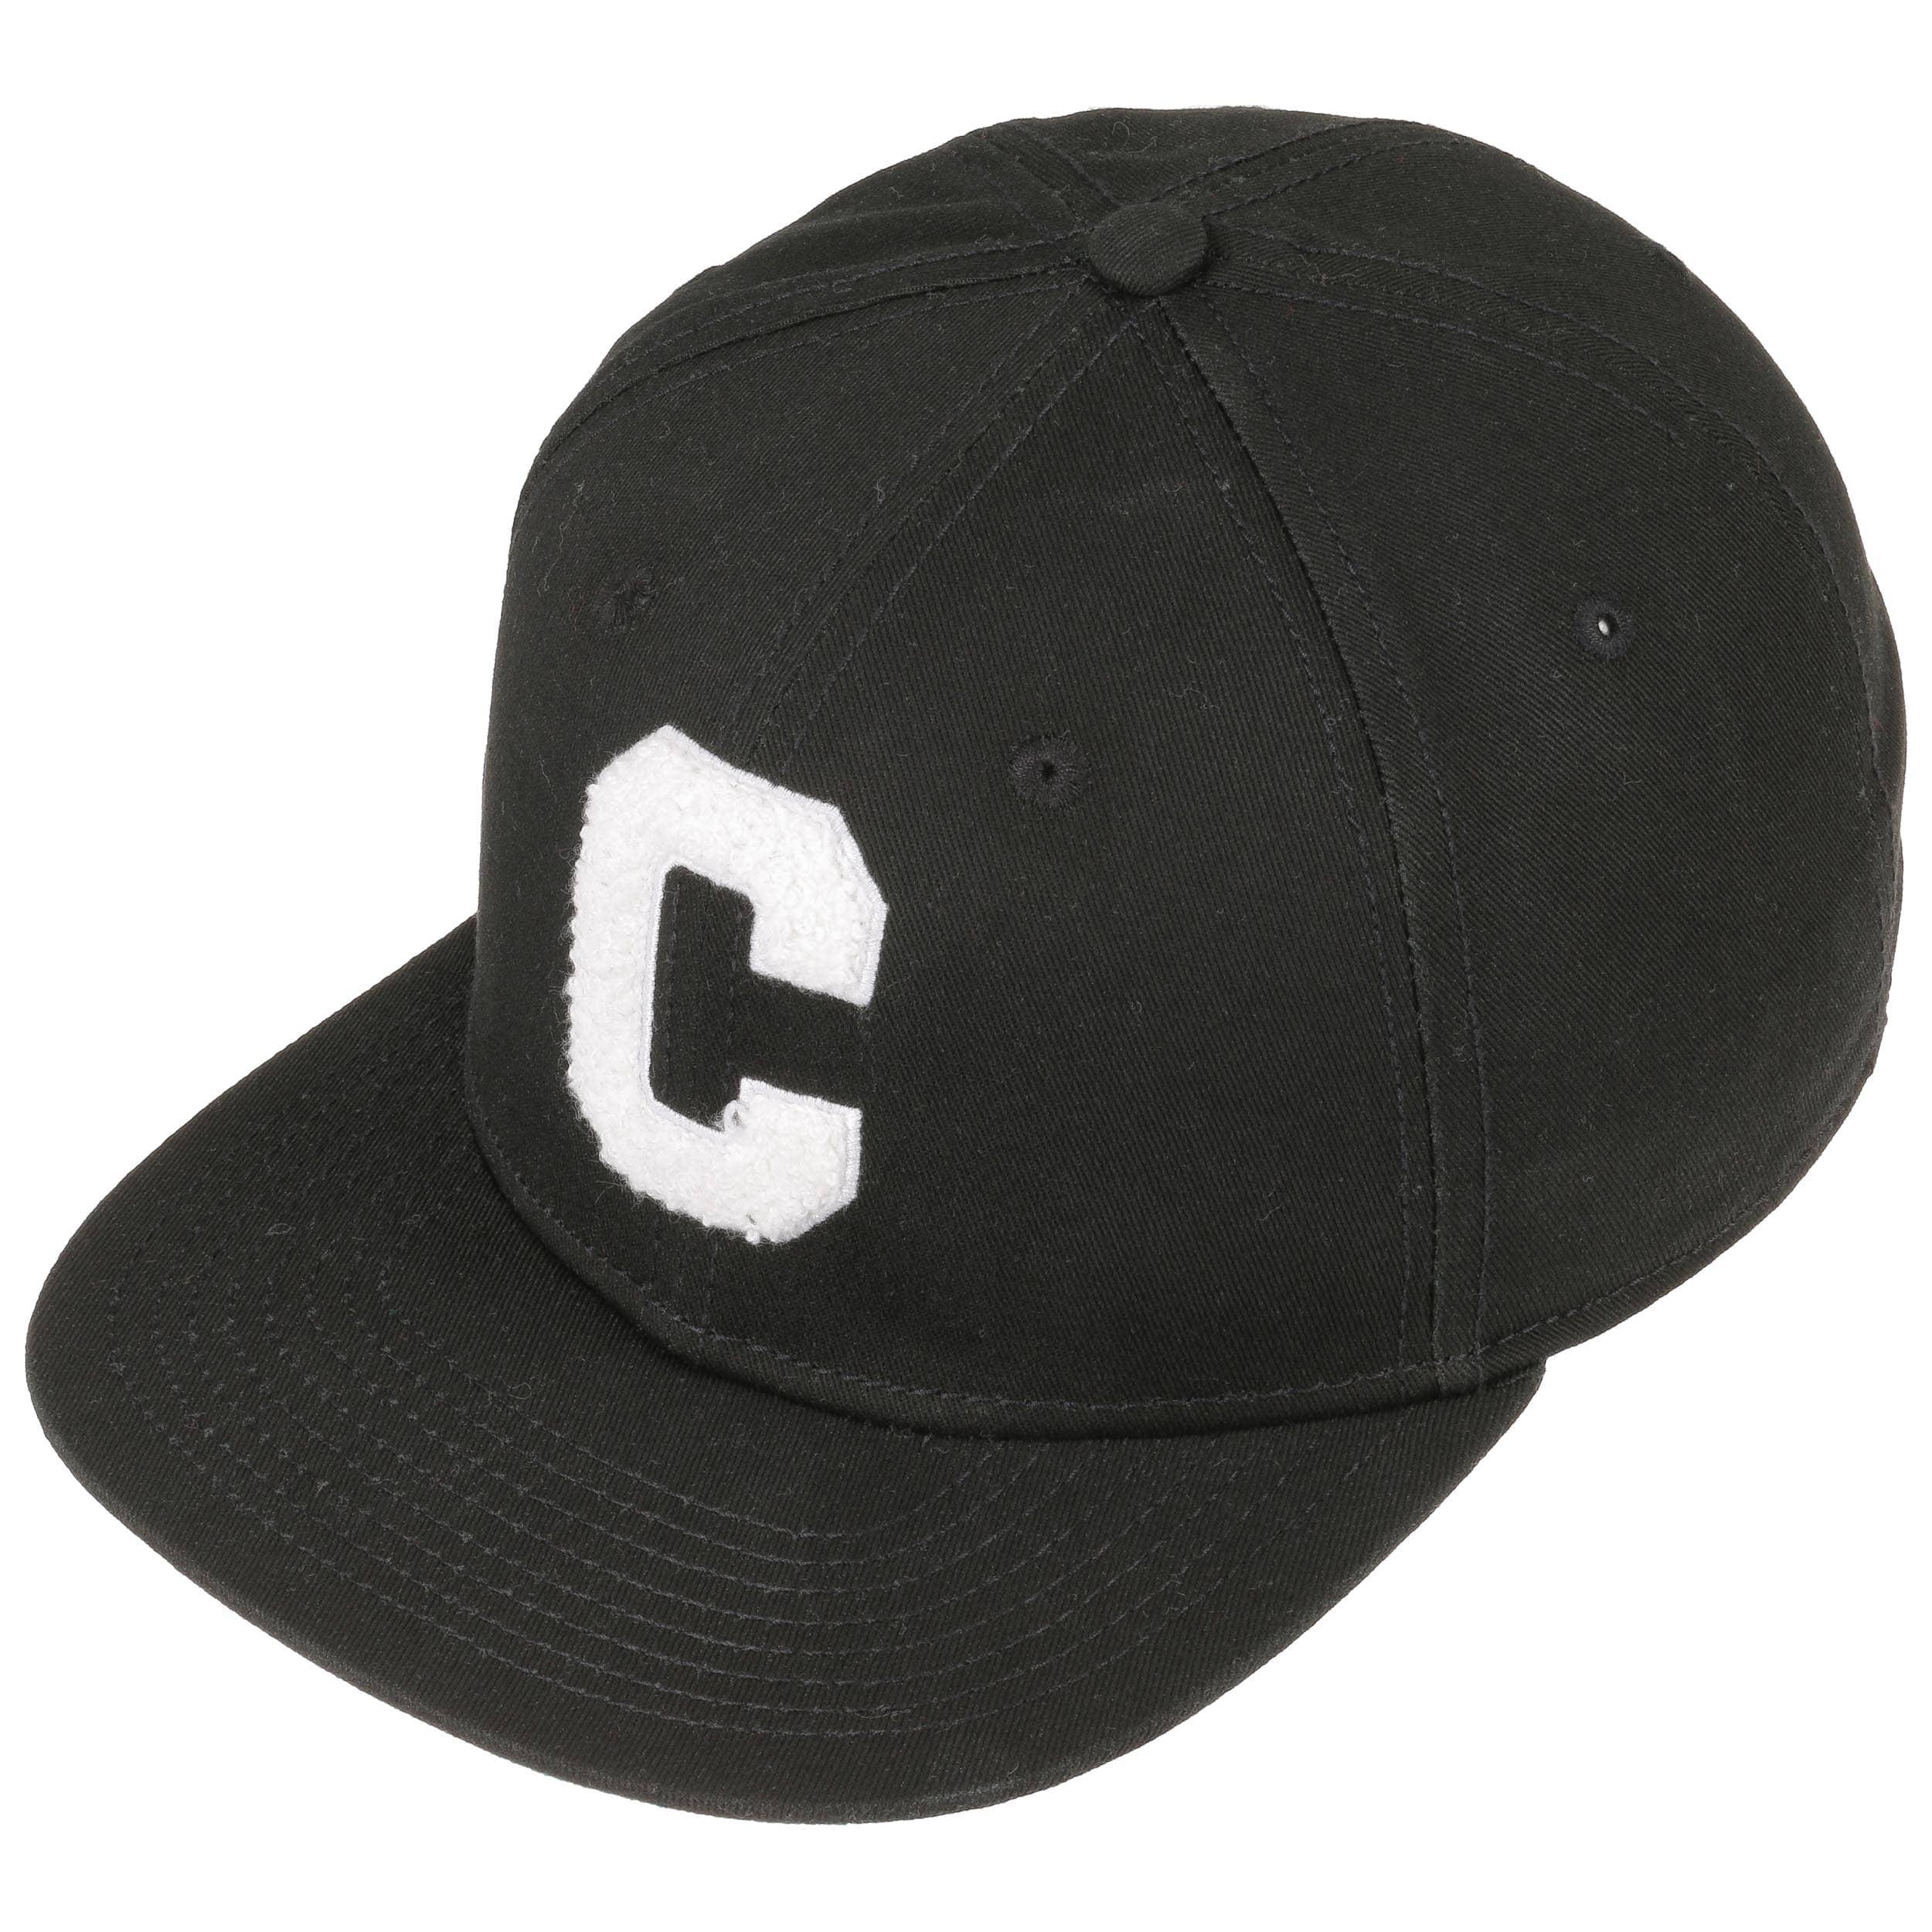 af7f83db ... Chenille C Snapback Cap by Converse - black 1 ...